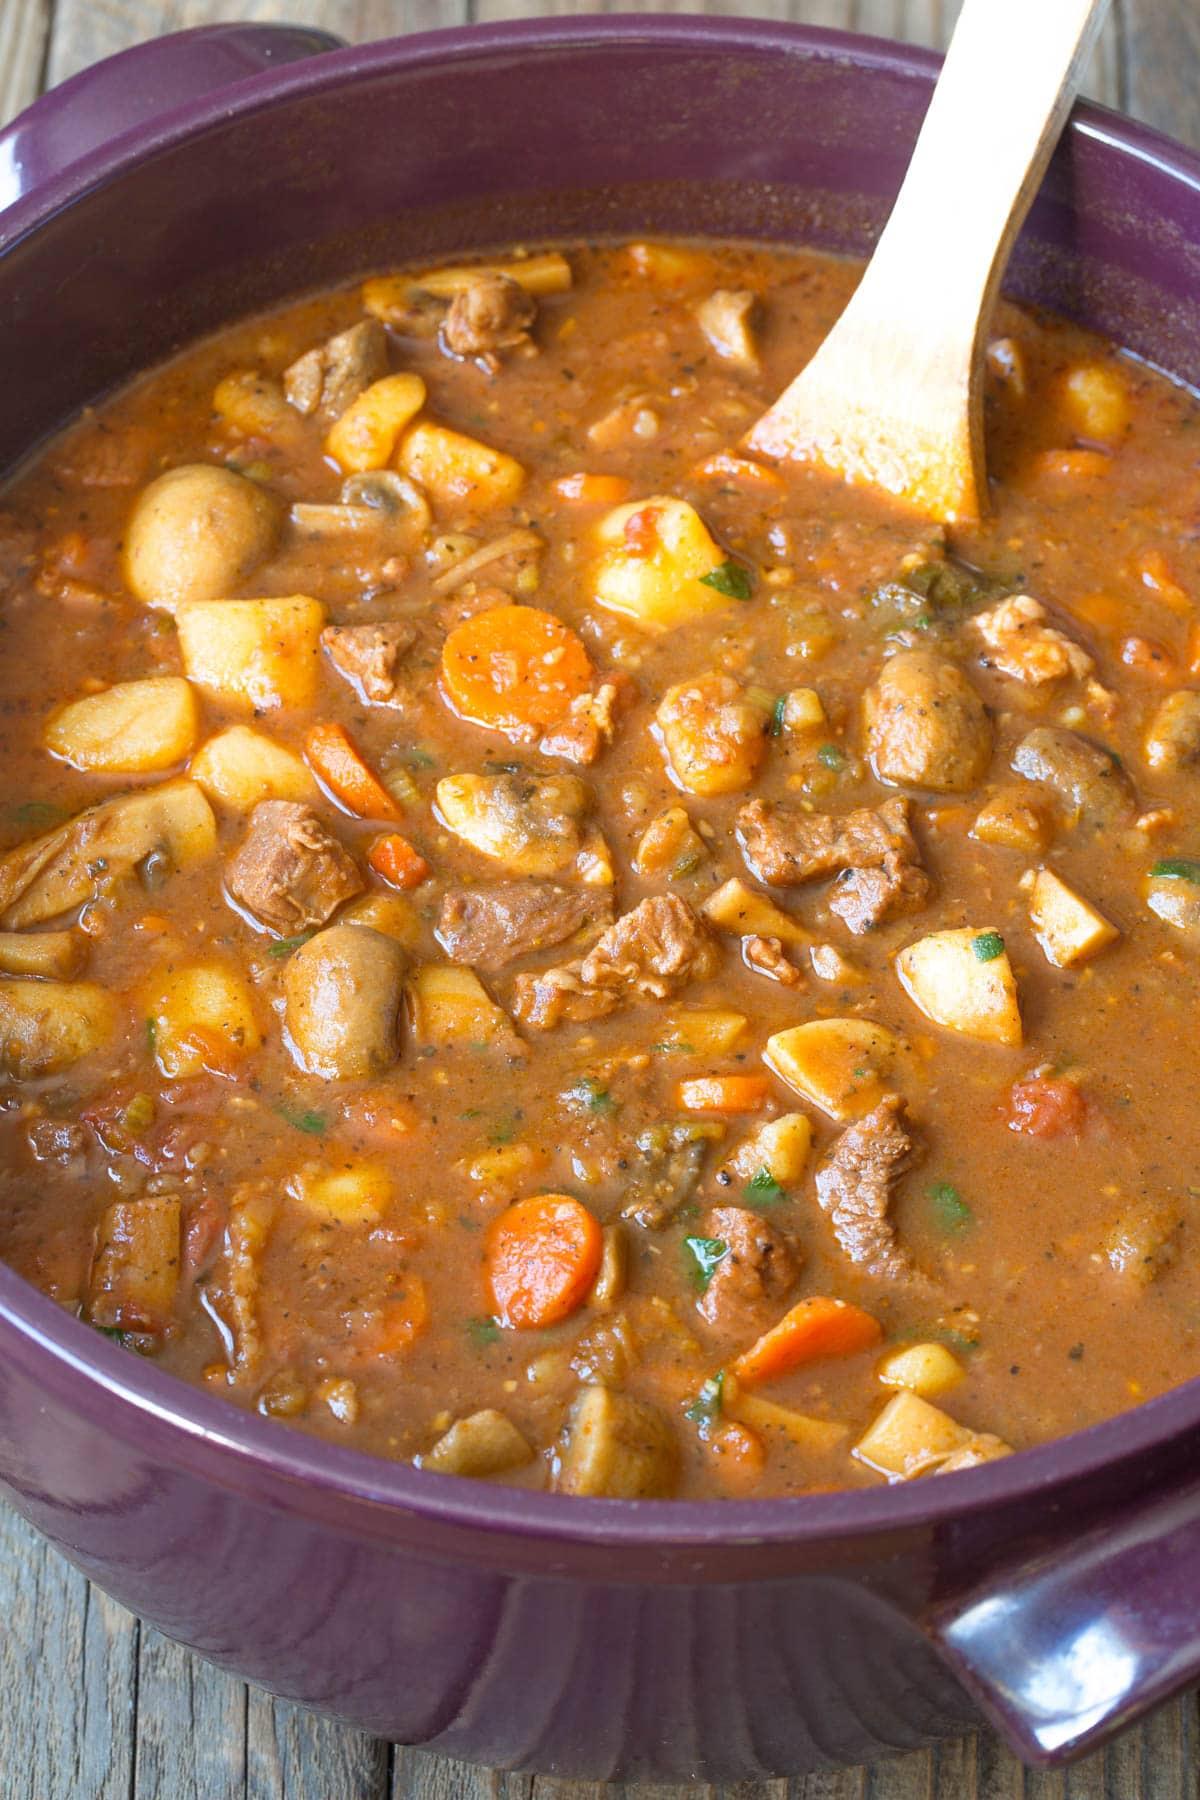 How to Make Beef Stew #ASpicyPerspective #BeefStew #BeefStewRecipe #Stew #StewRecipe #Beef #Crockpot #InstantPot #Stovetop #BeefStewCrockpot #SlowCookerBeefStew #BestBeefStew #HowtoMakeBeefStew